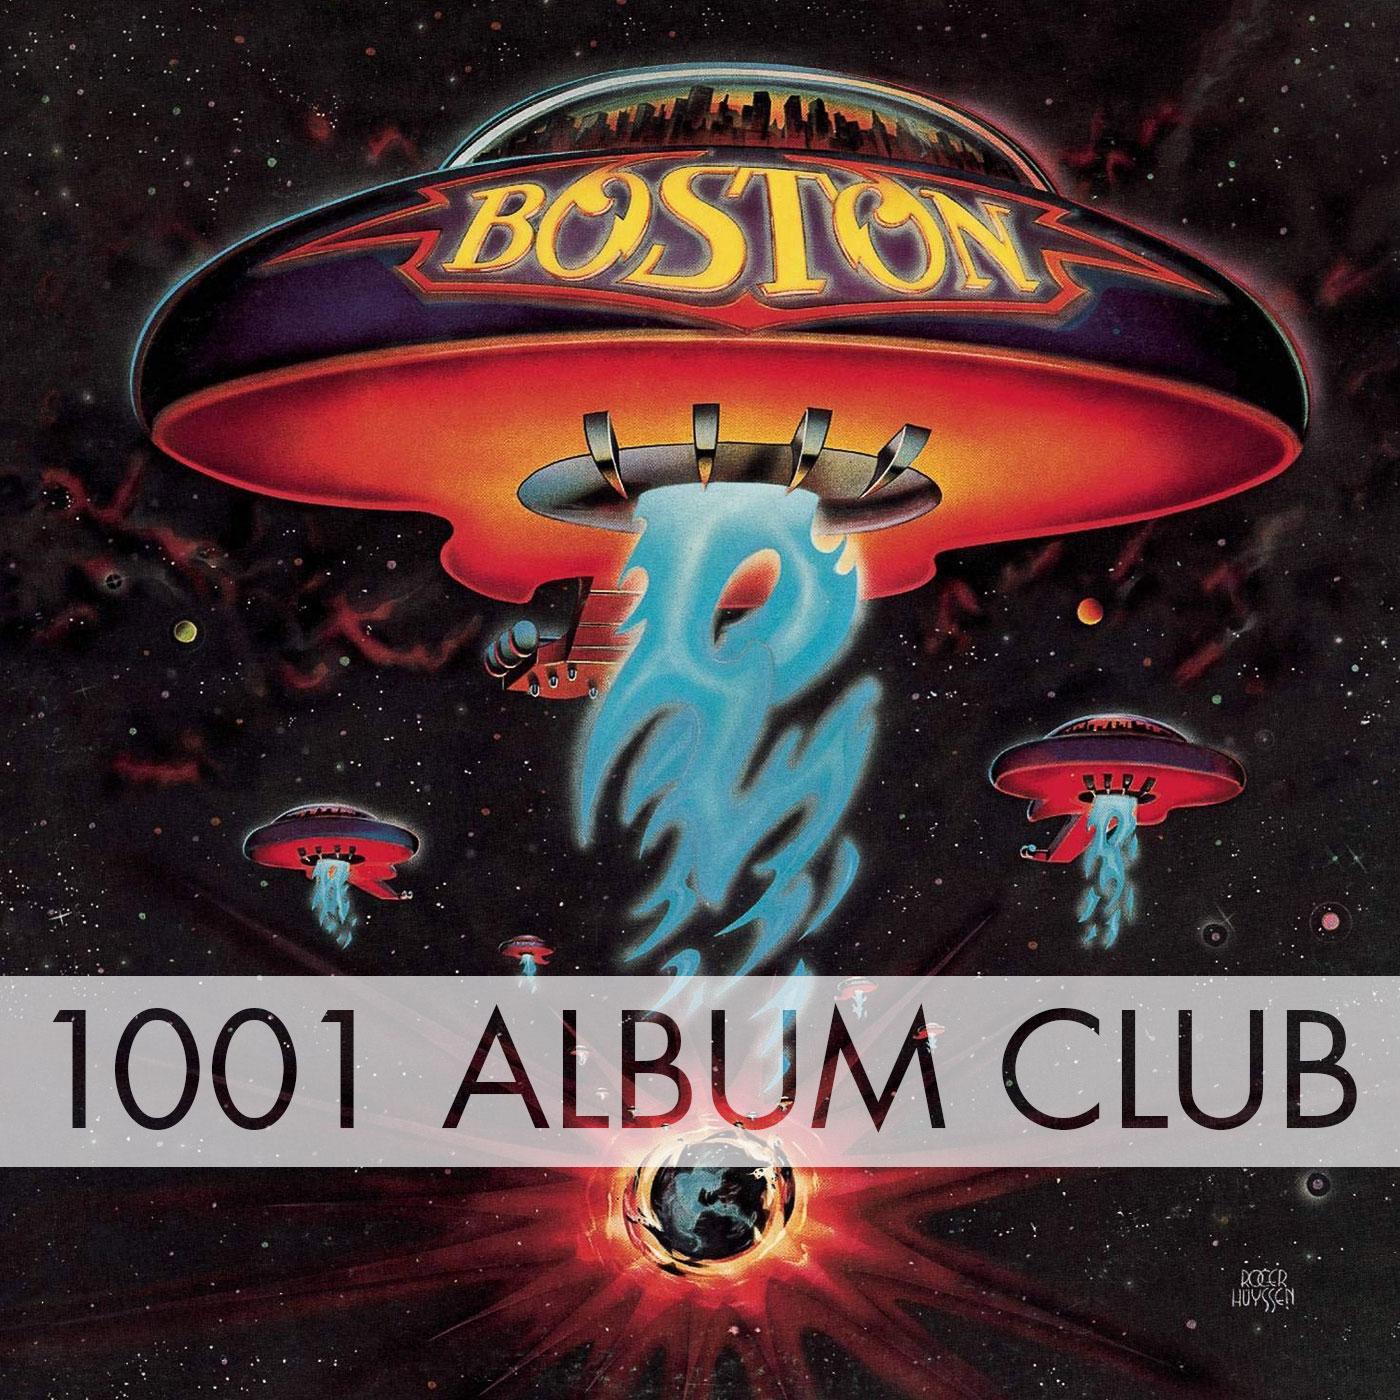 353 Boston - Boston